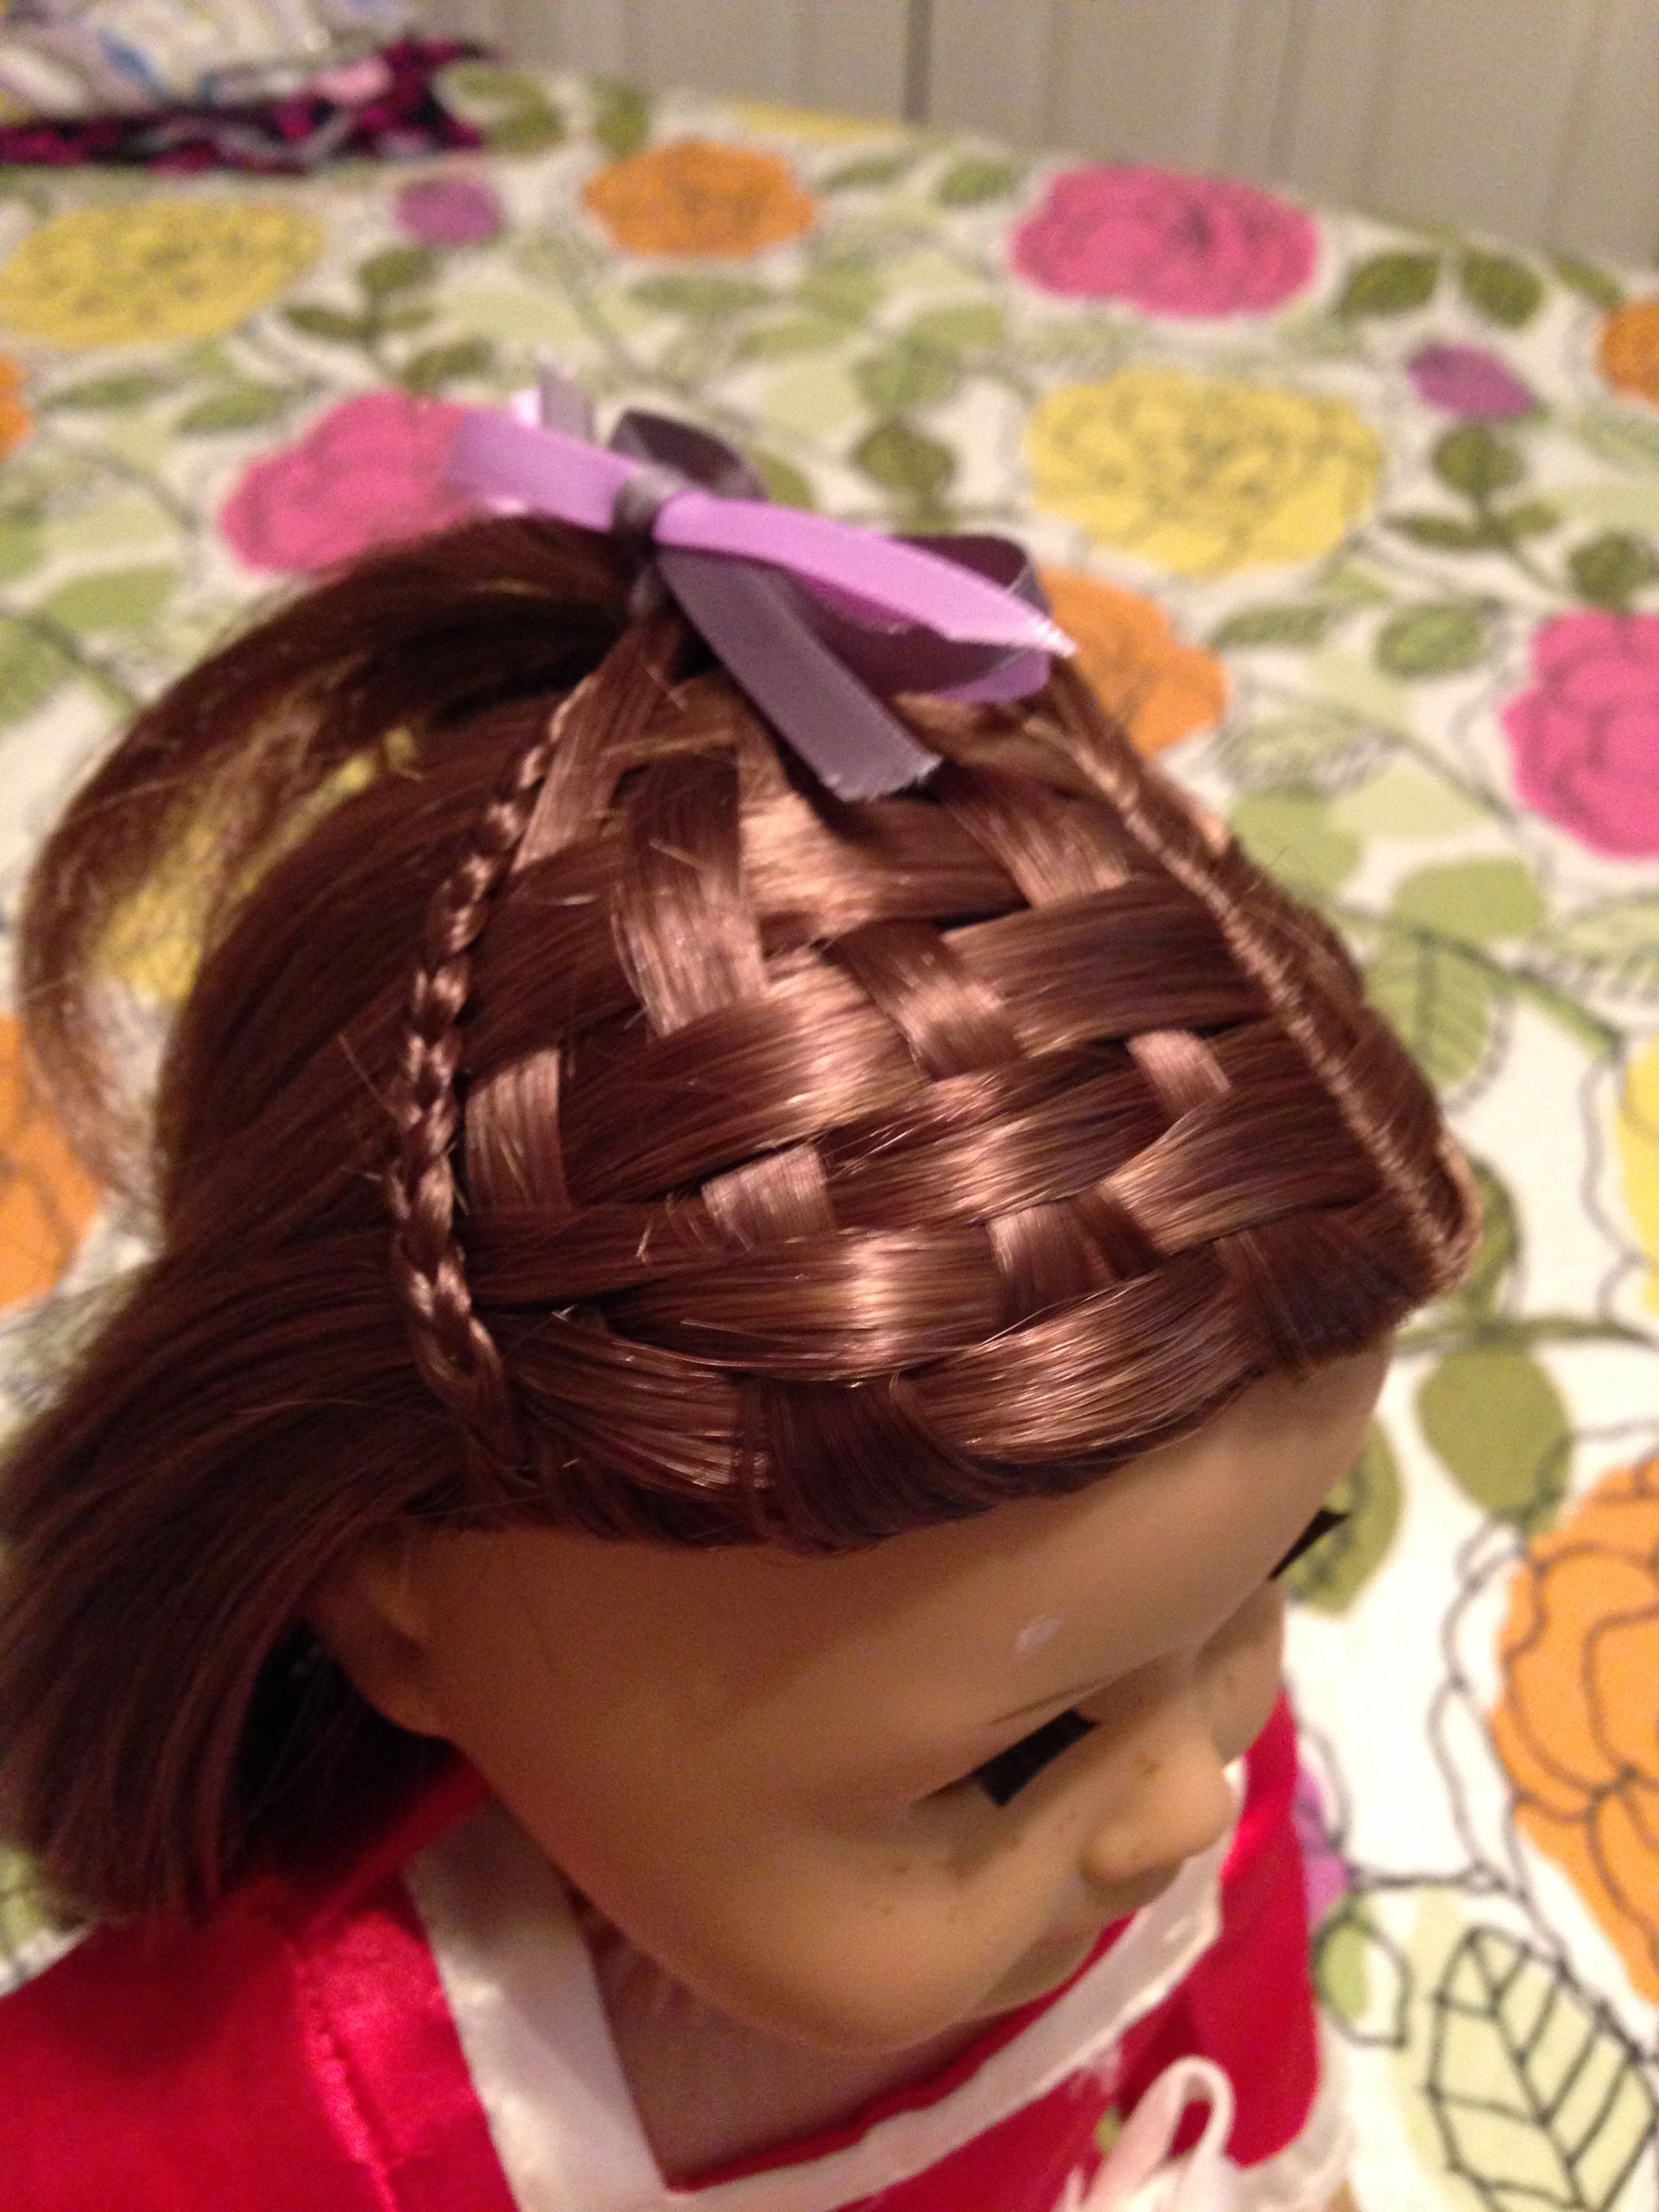 American girl doll hair salon The basket weave braid is incredible